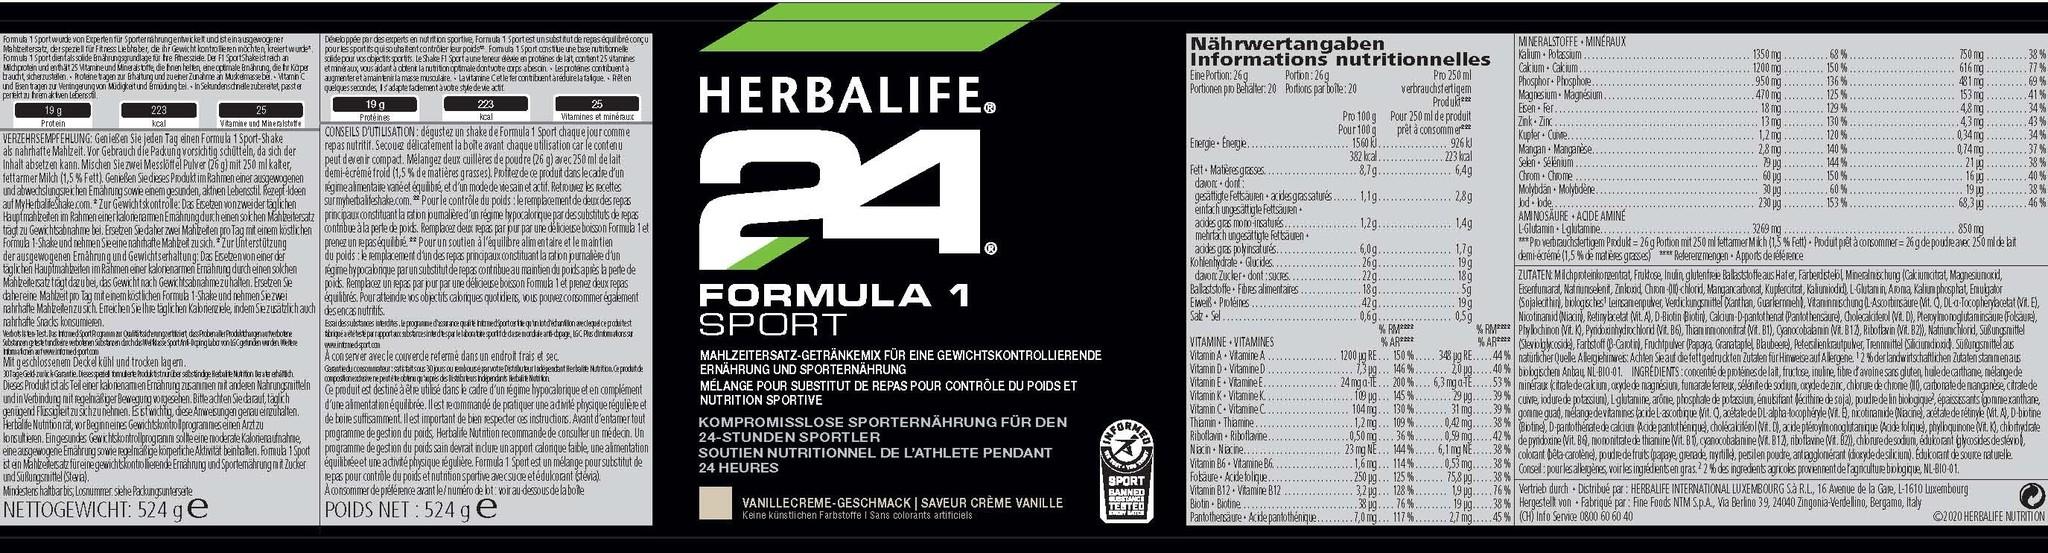 Herbalife 24 - Formula 1 Pro Vaniglia Crème